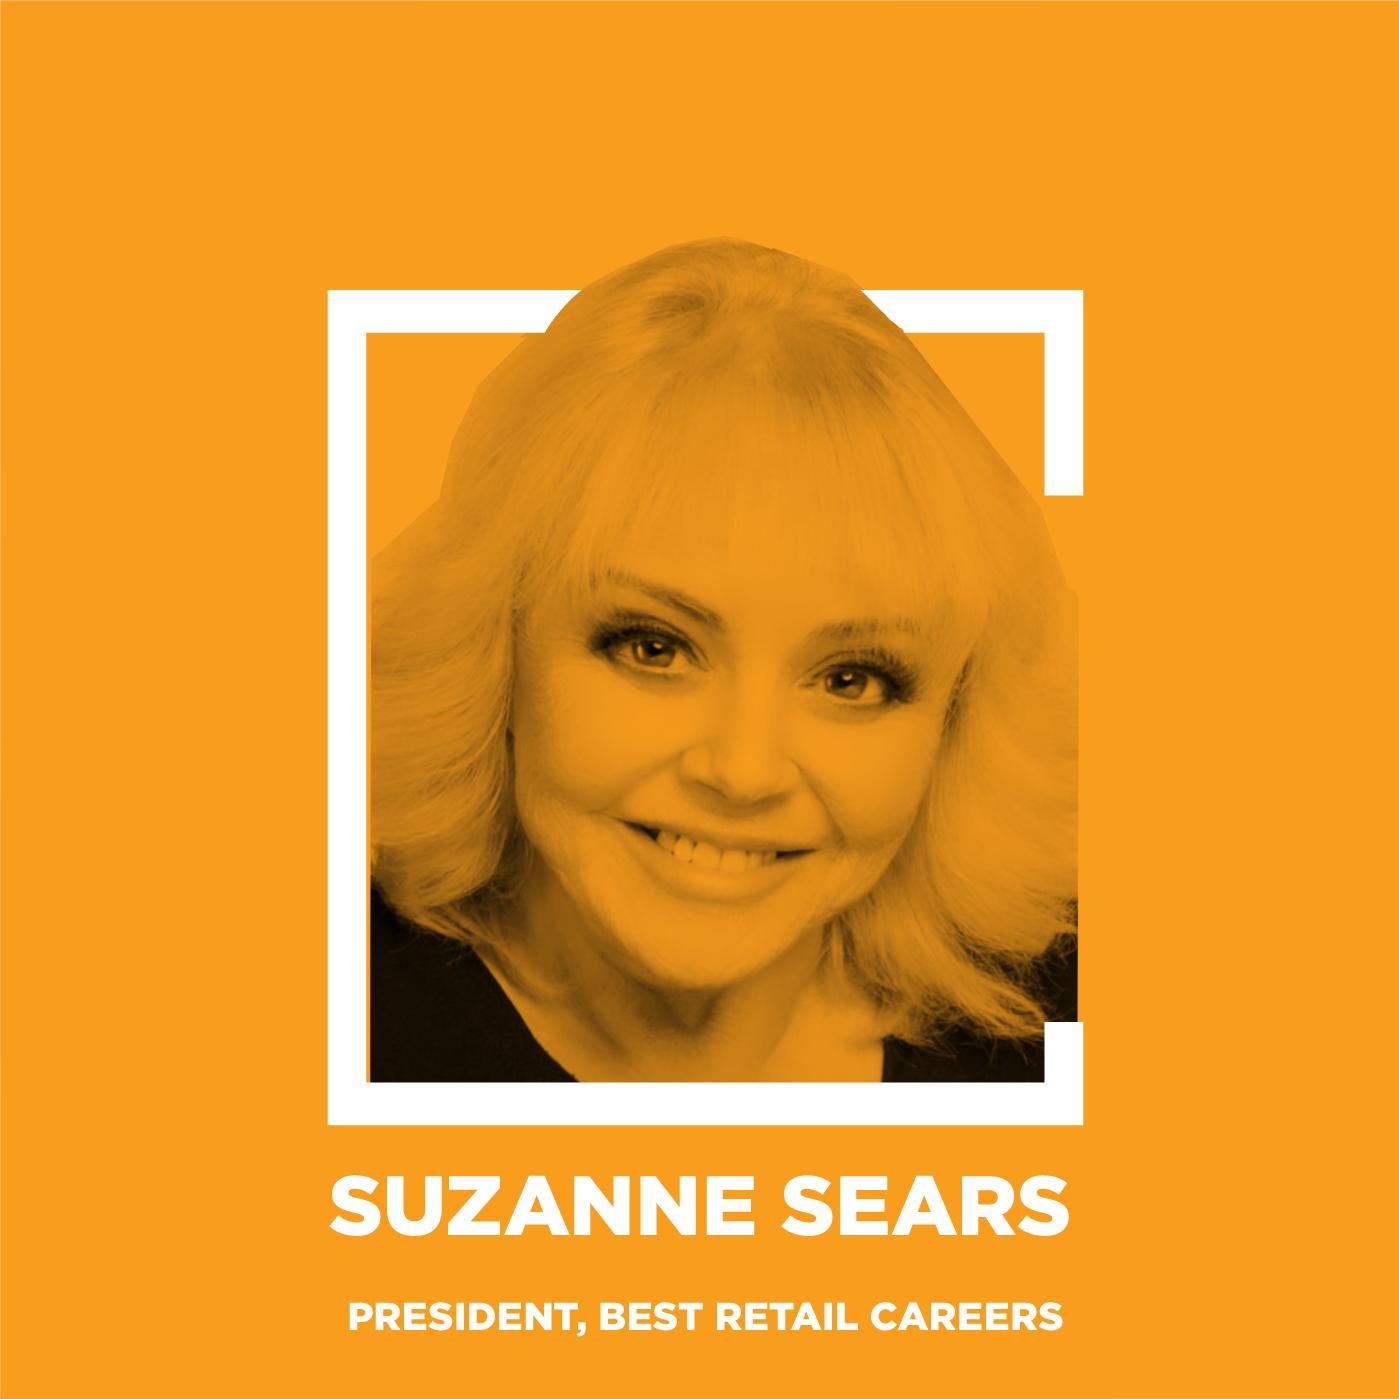 Suzanne Sears Podcast Headshot